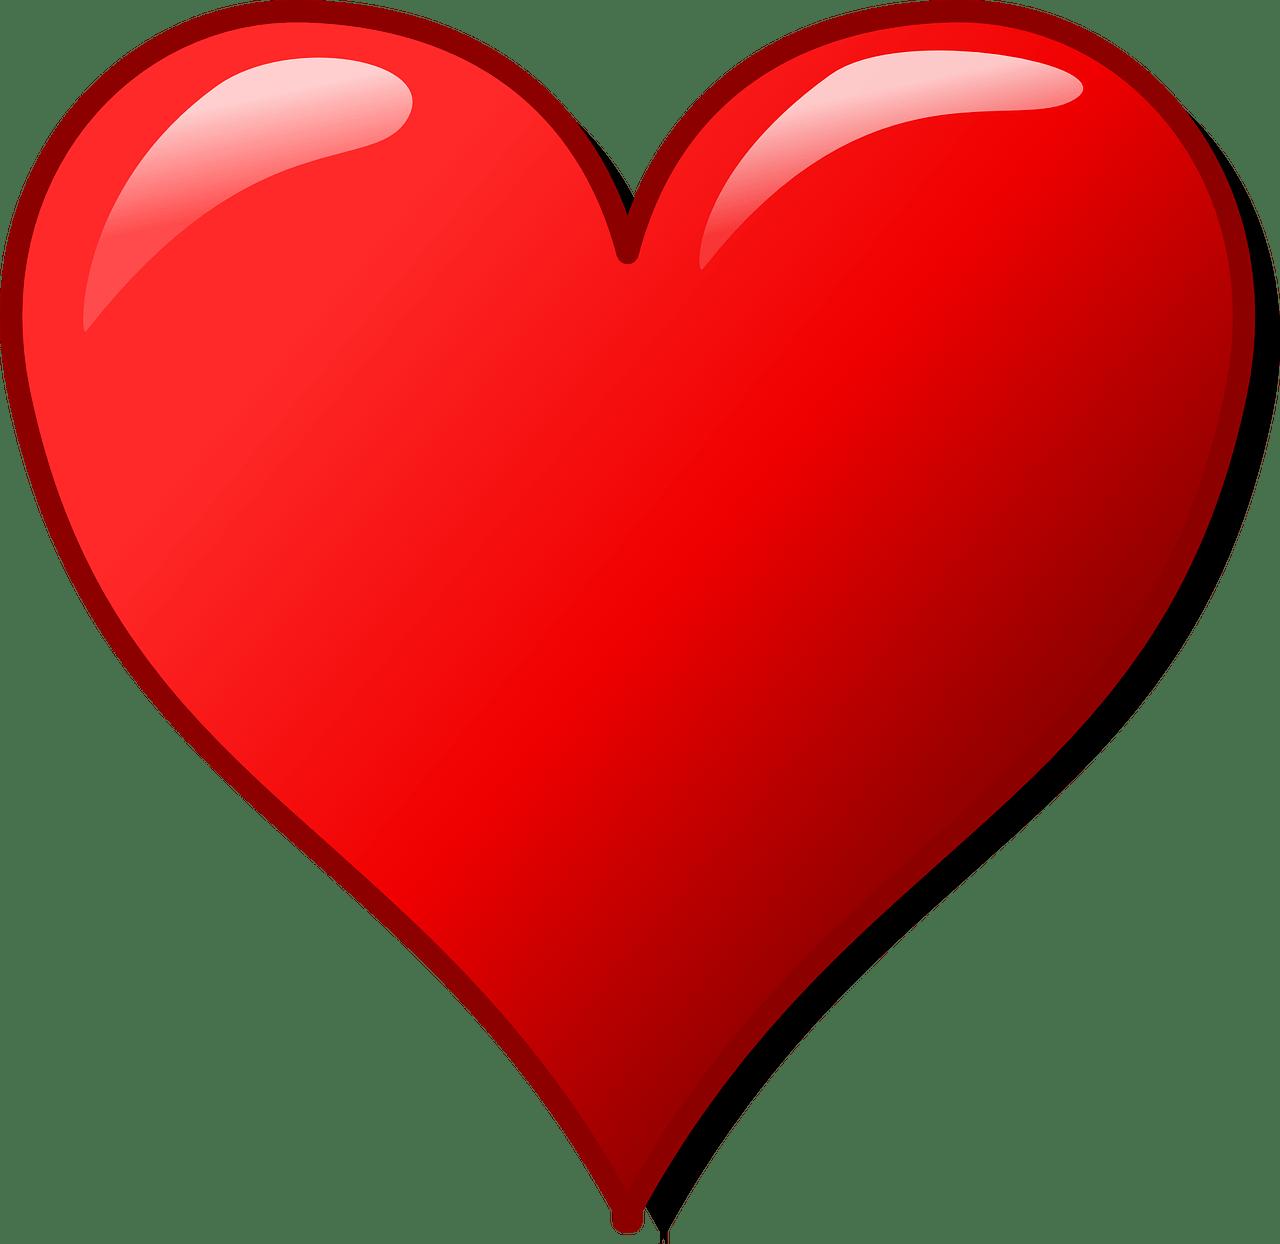 heart 26790 1280